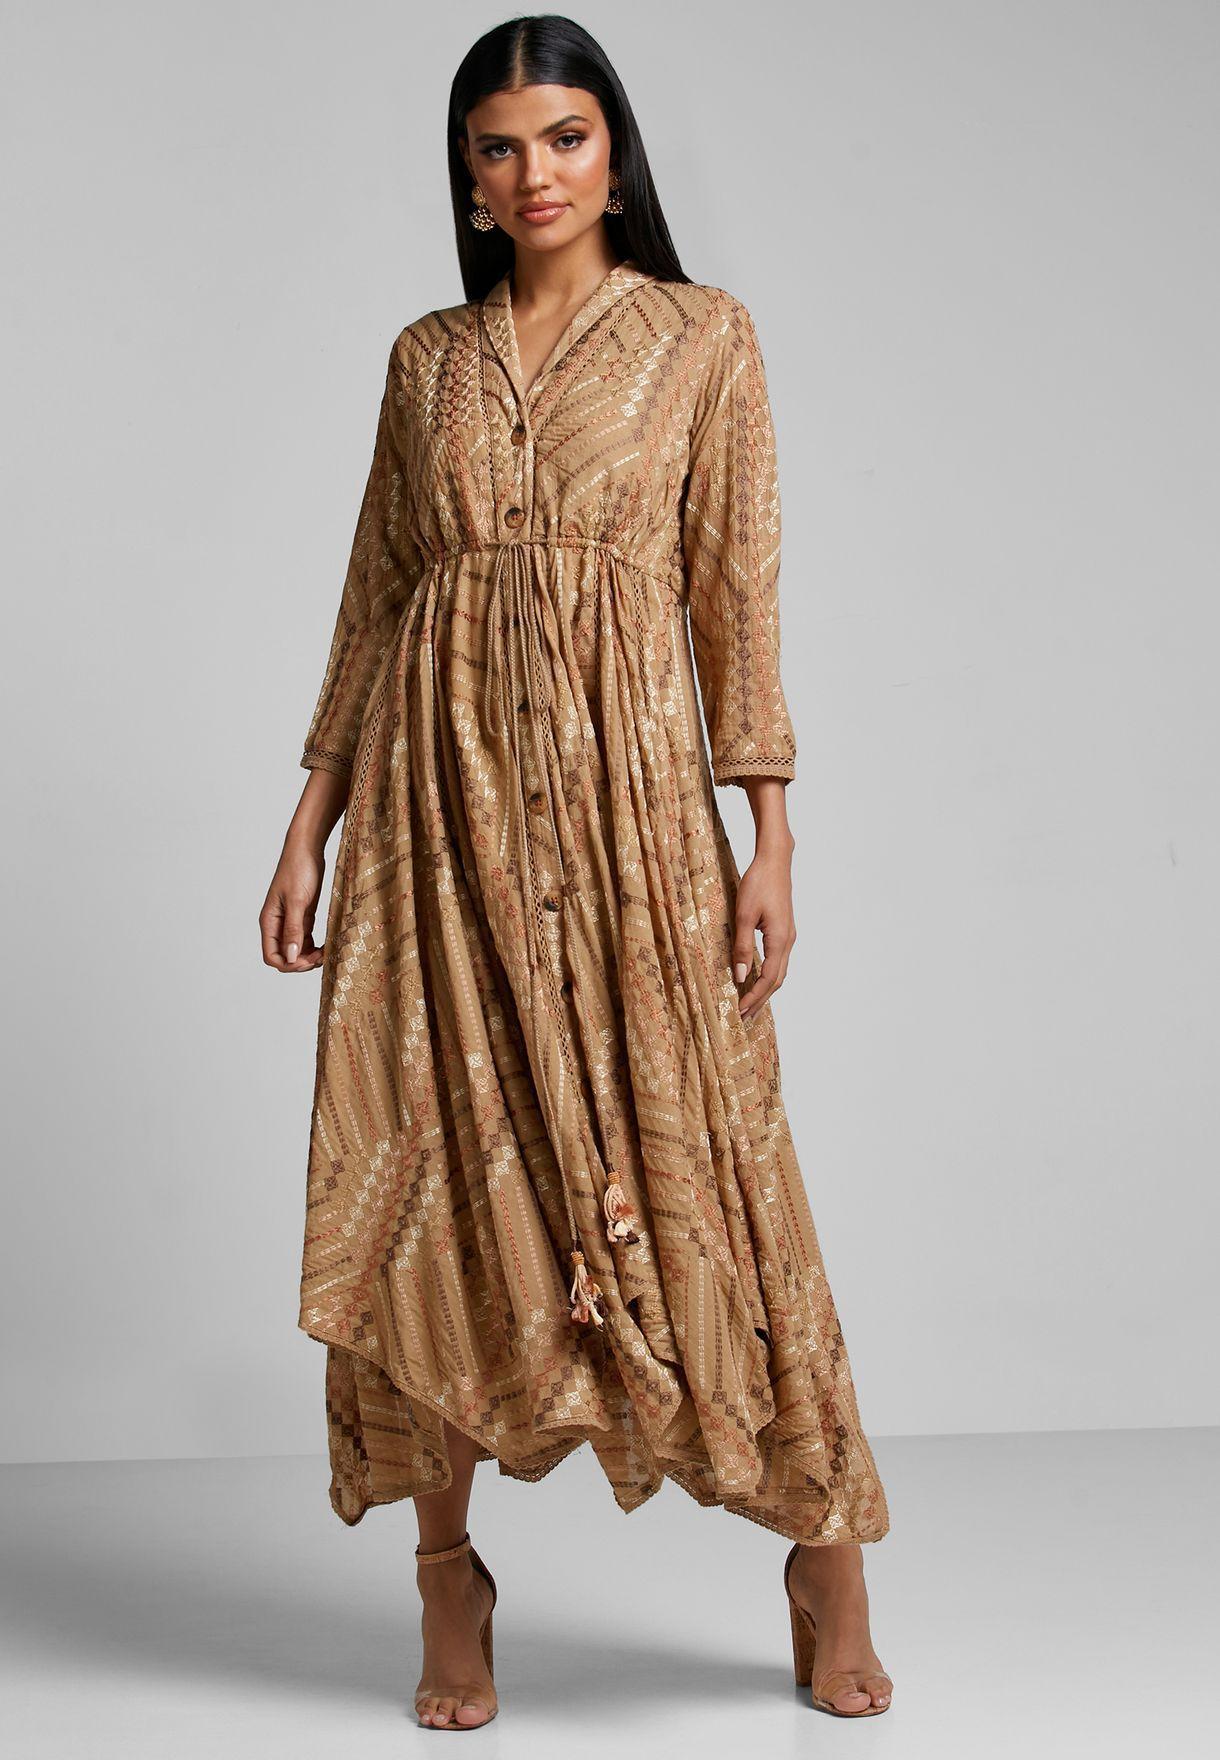 فستان مزين بتطريزات